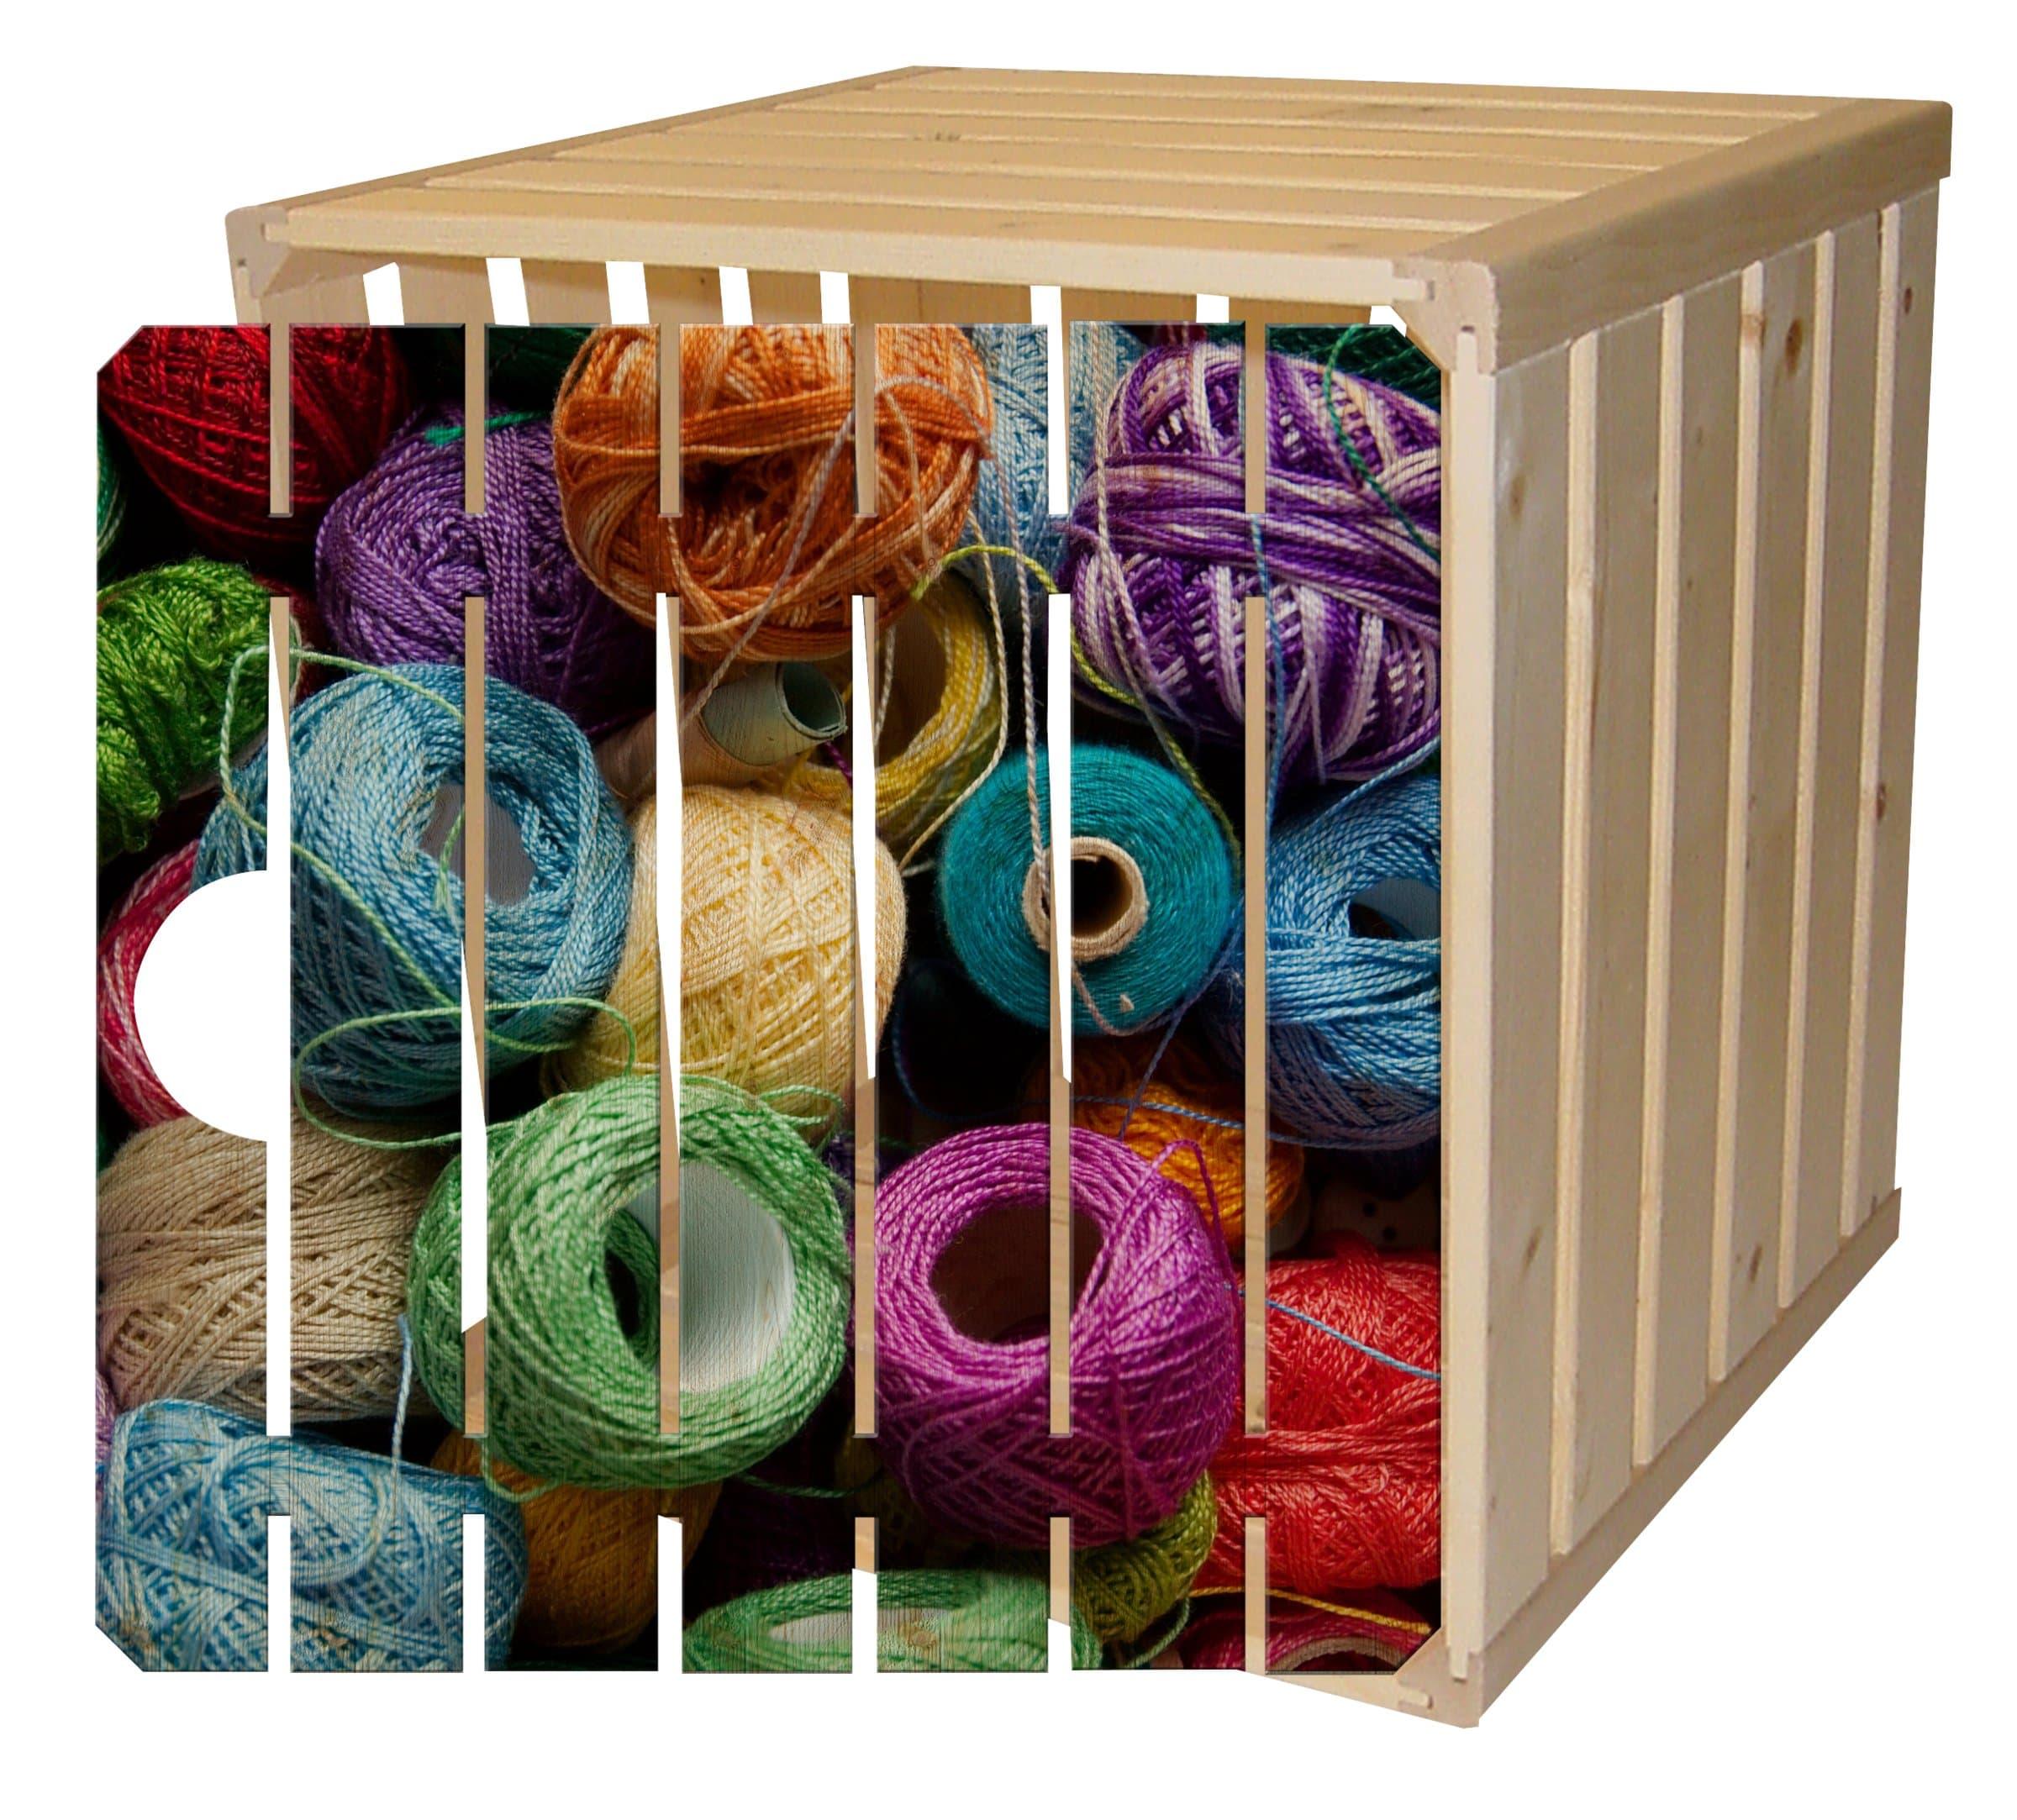 holzzollhaus harasse en bois avec porte a1 2 laine migros. Black Bedroom Furniture Sets. Home Design Ideas